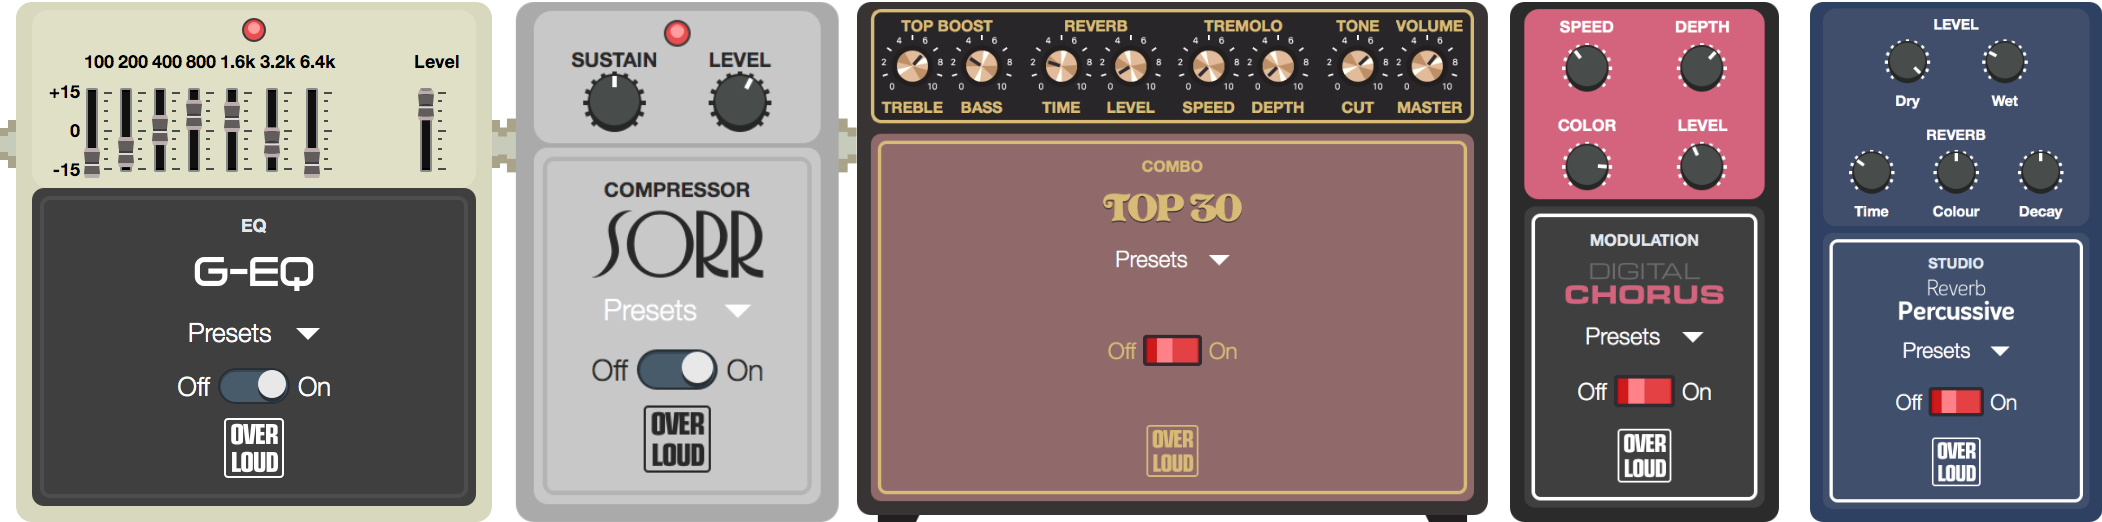 Guitar Pro 7 Signature Sounds Explained | Guitar Pro Blog – Arobas Music